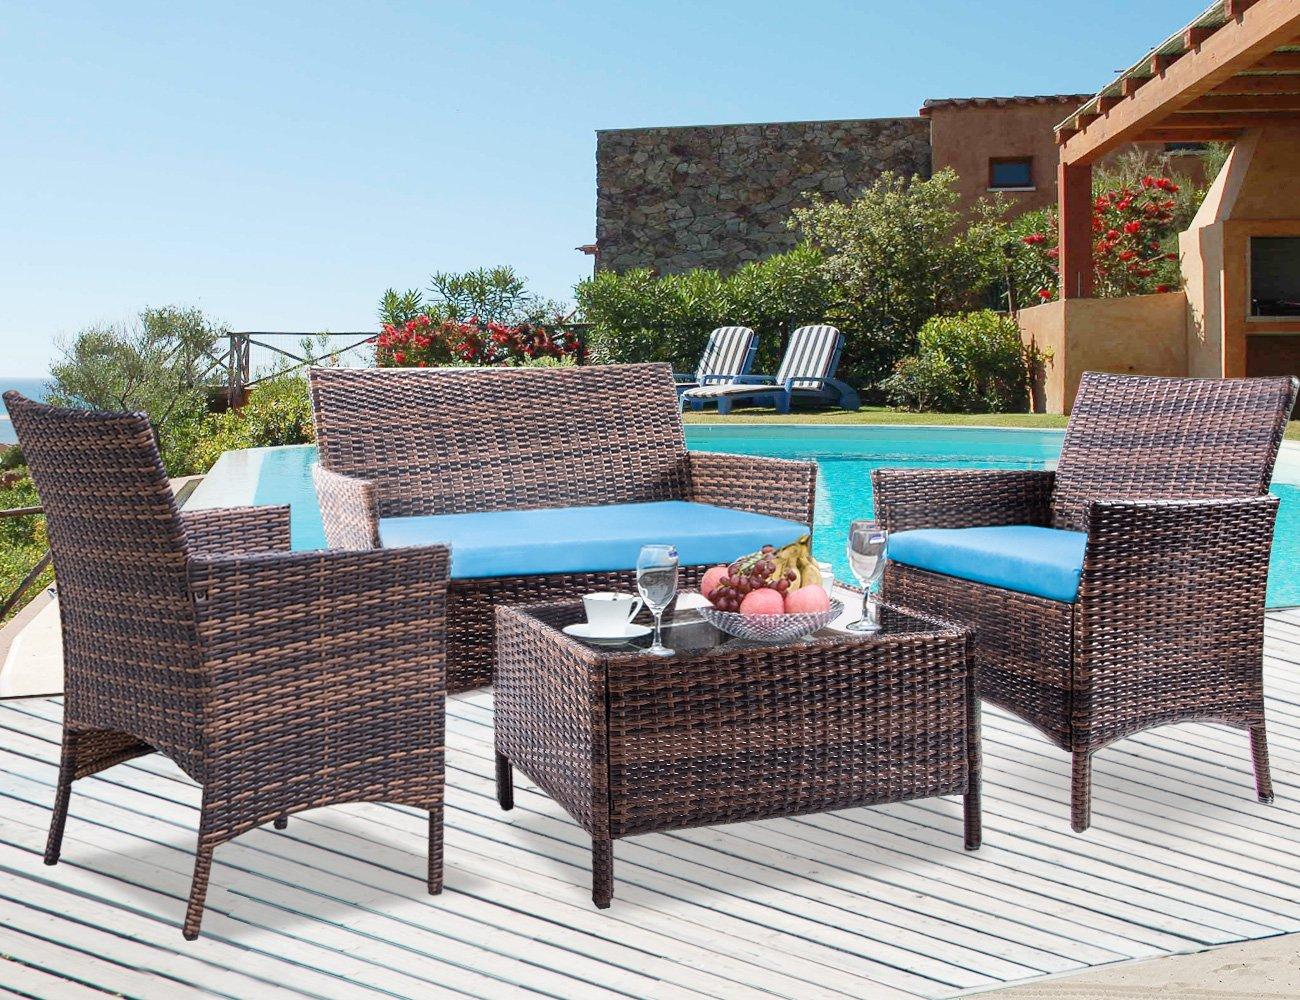 Outdoor Furniture -  -  - 81lXAdunMfL -